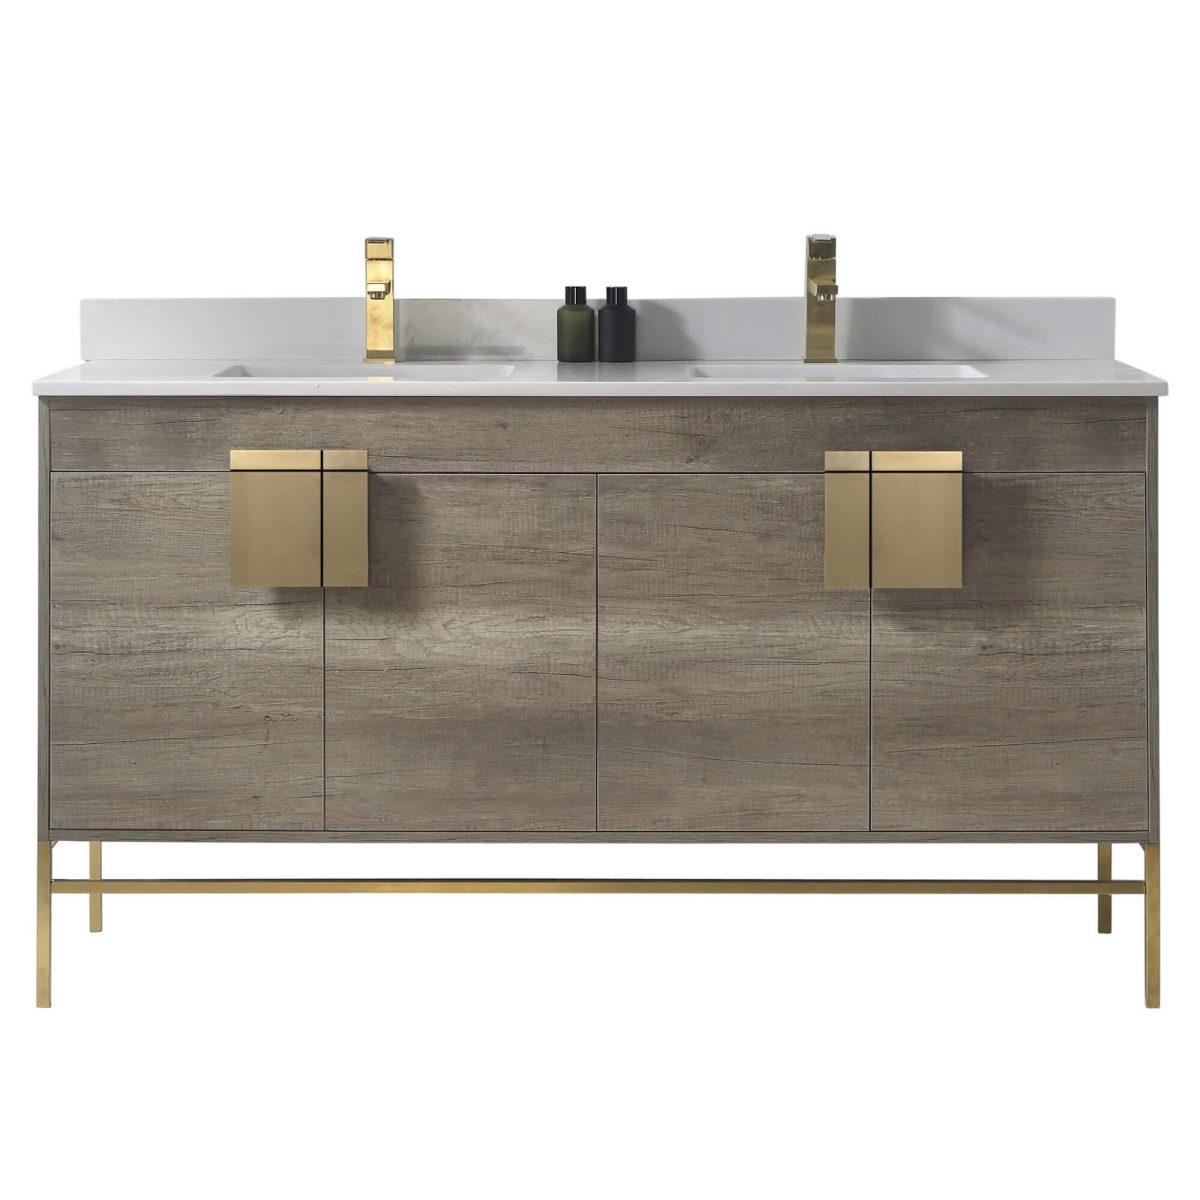 "Shawbridge 60"" Modern Double Bathroom Vanity  Shadow Gray with Satin Brass Hardware"